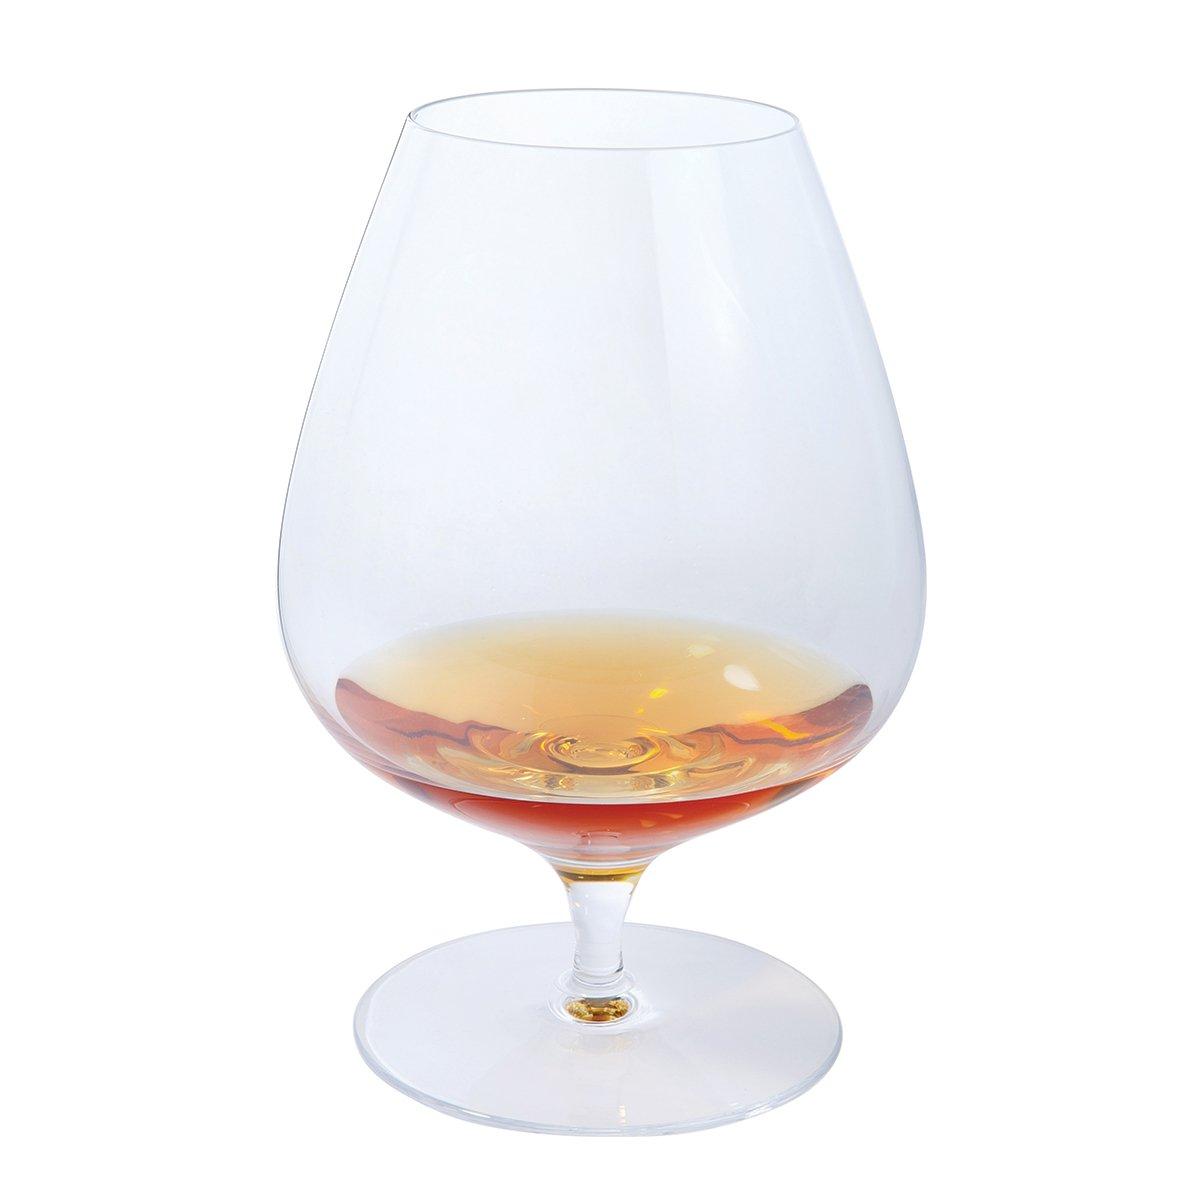 Dartington Crystal Origin Brandy Glass